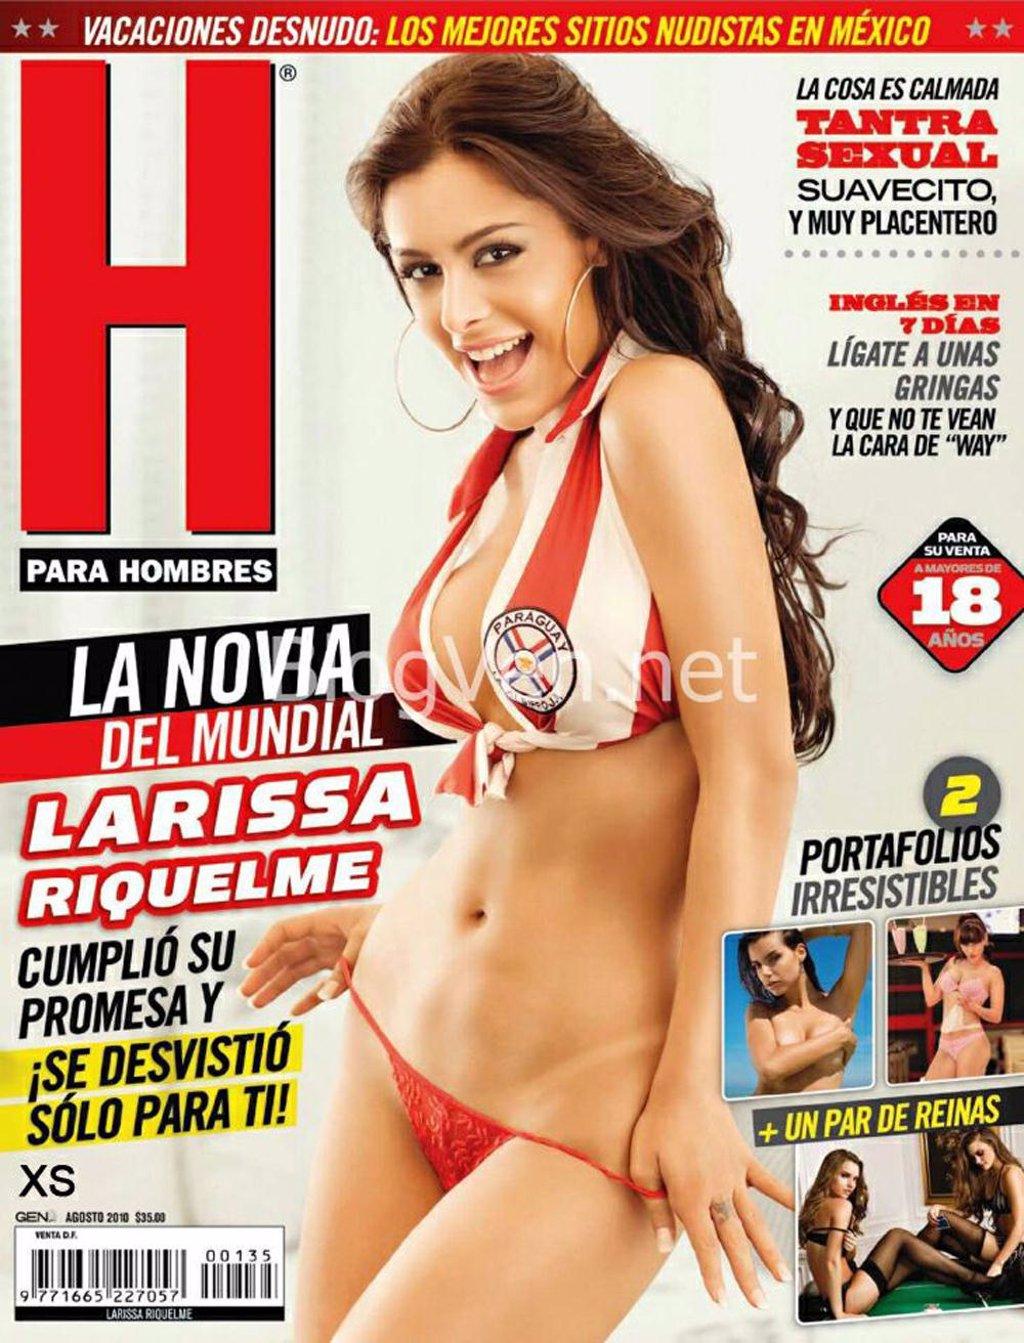 Larissa Riquelme promete desnudarse si El Salvador